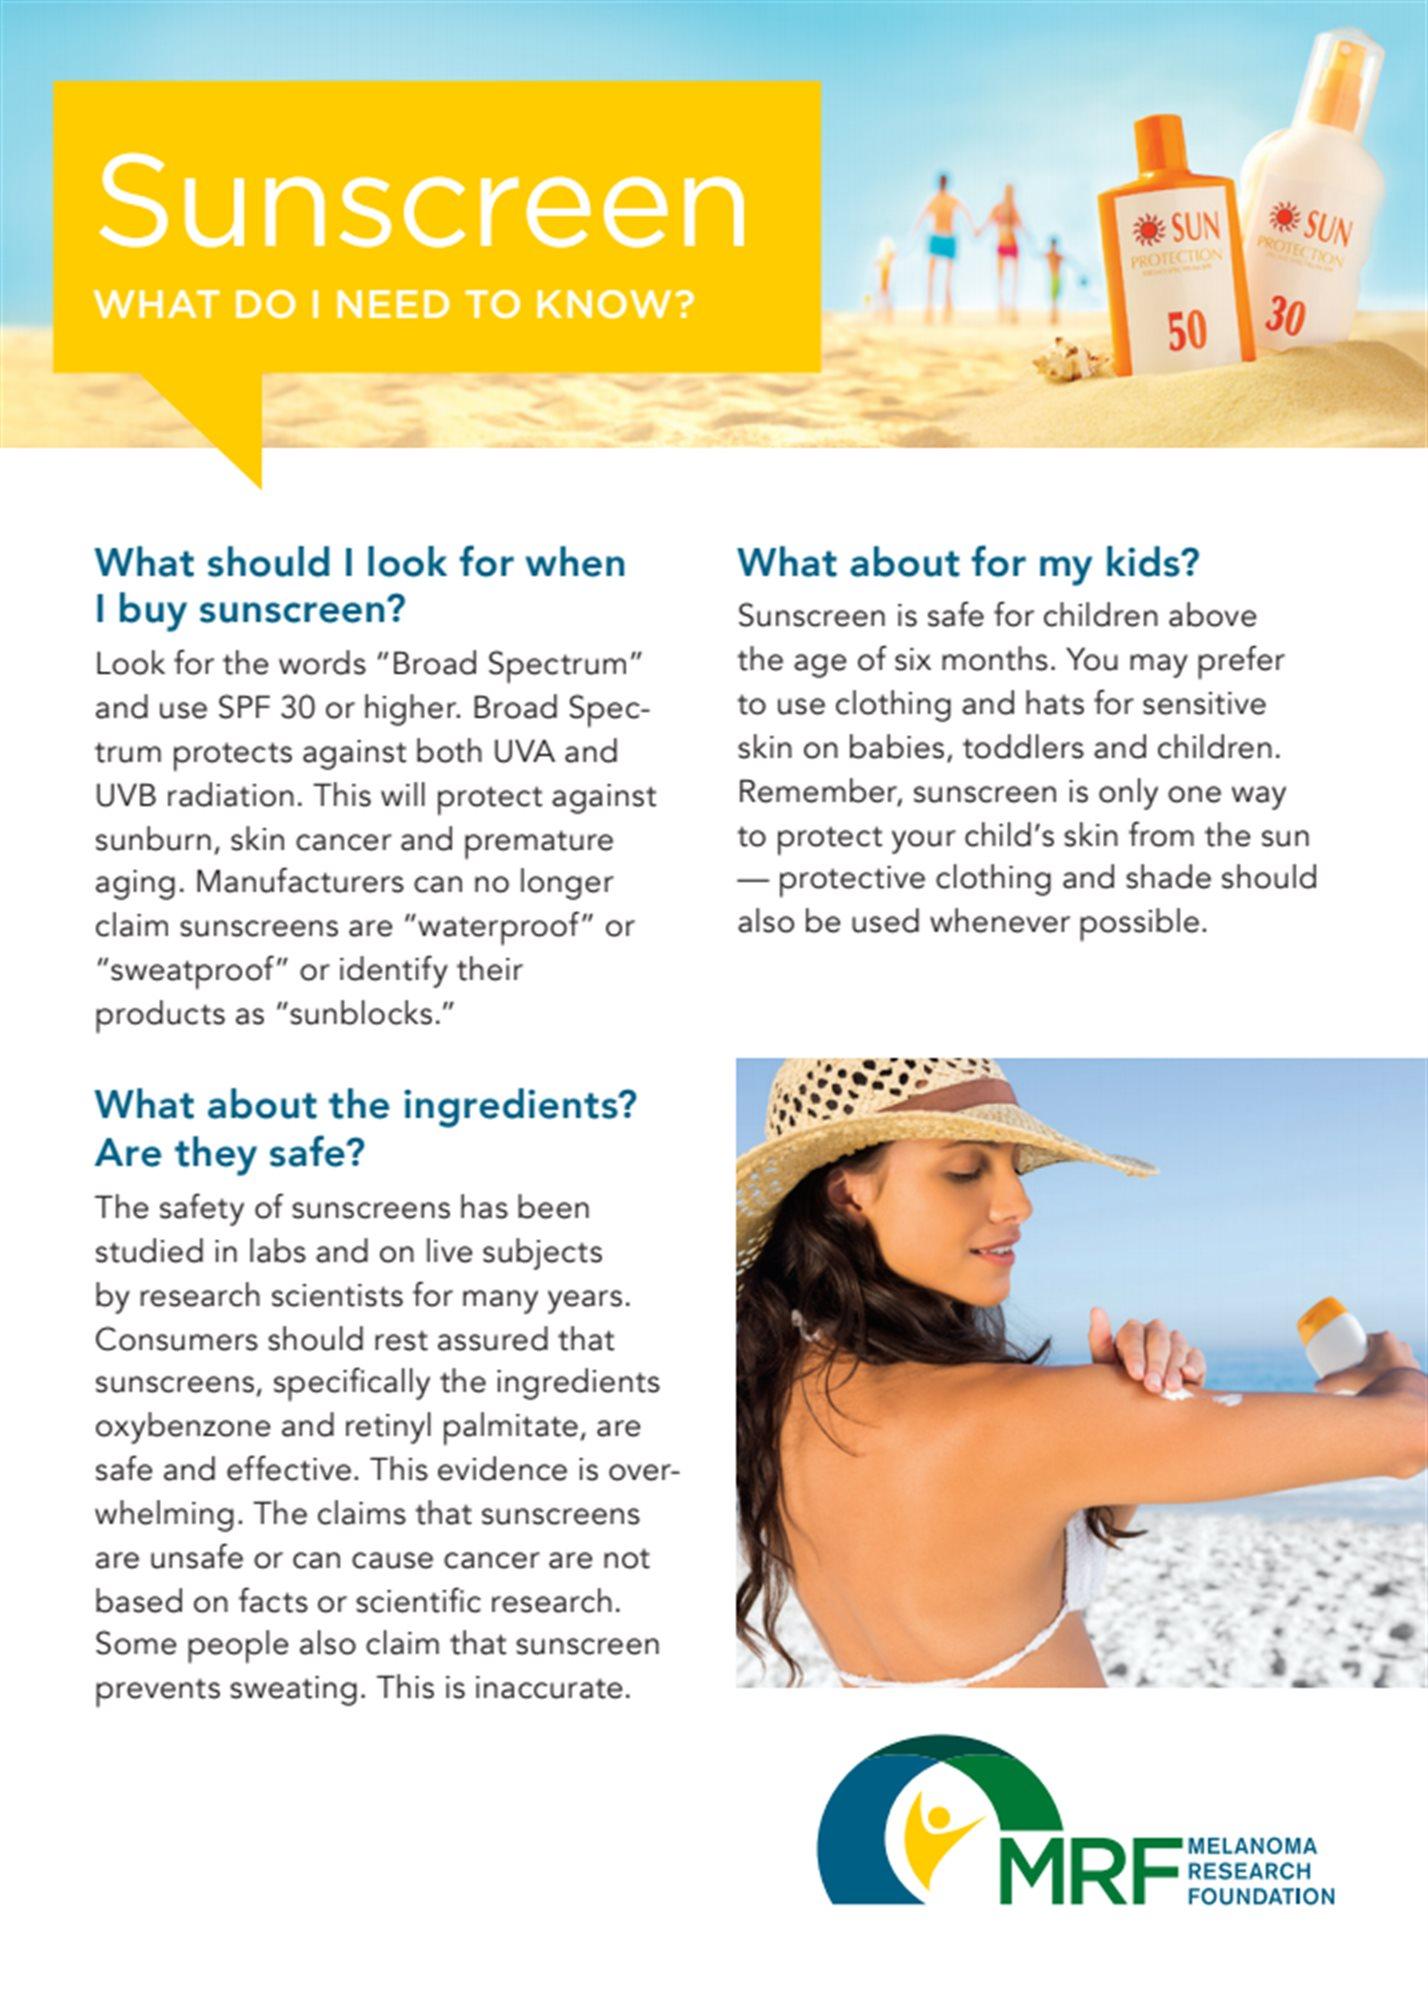 MRF s Sunscreen Postcard